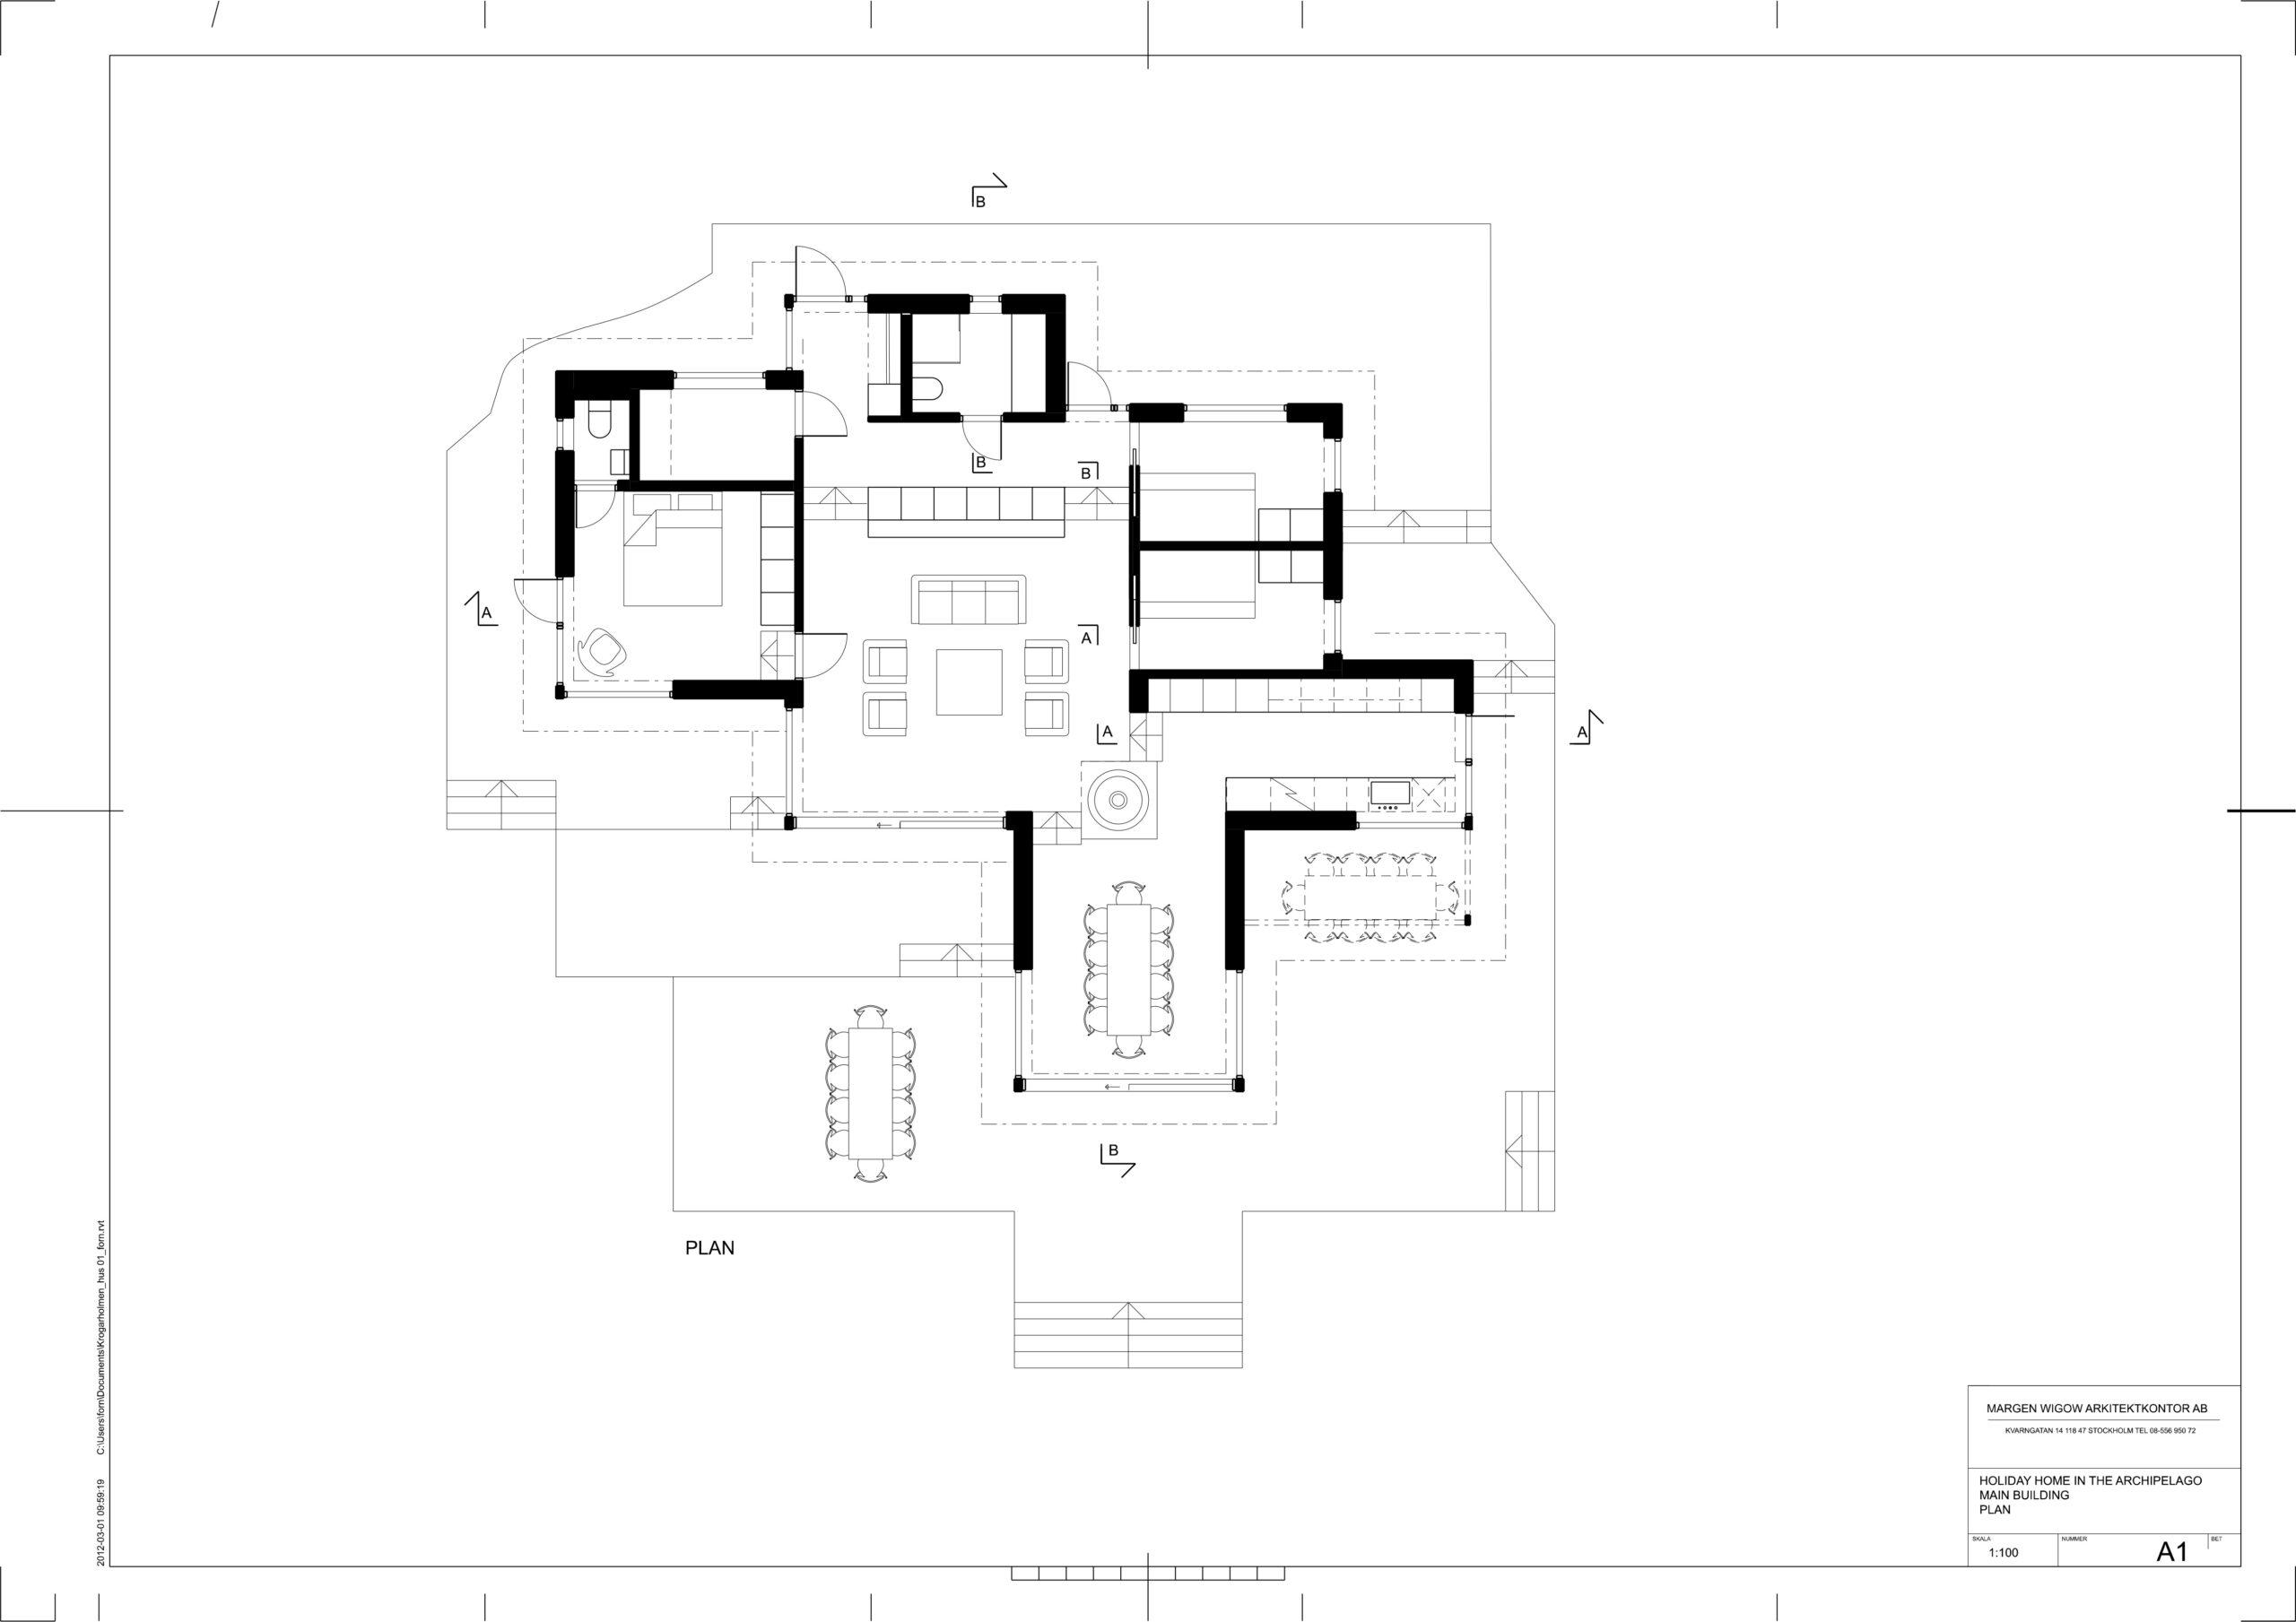 yxlö ritningar huvudbyggnad-Default